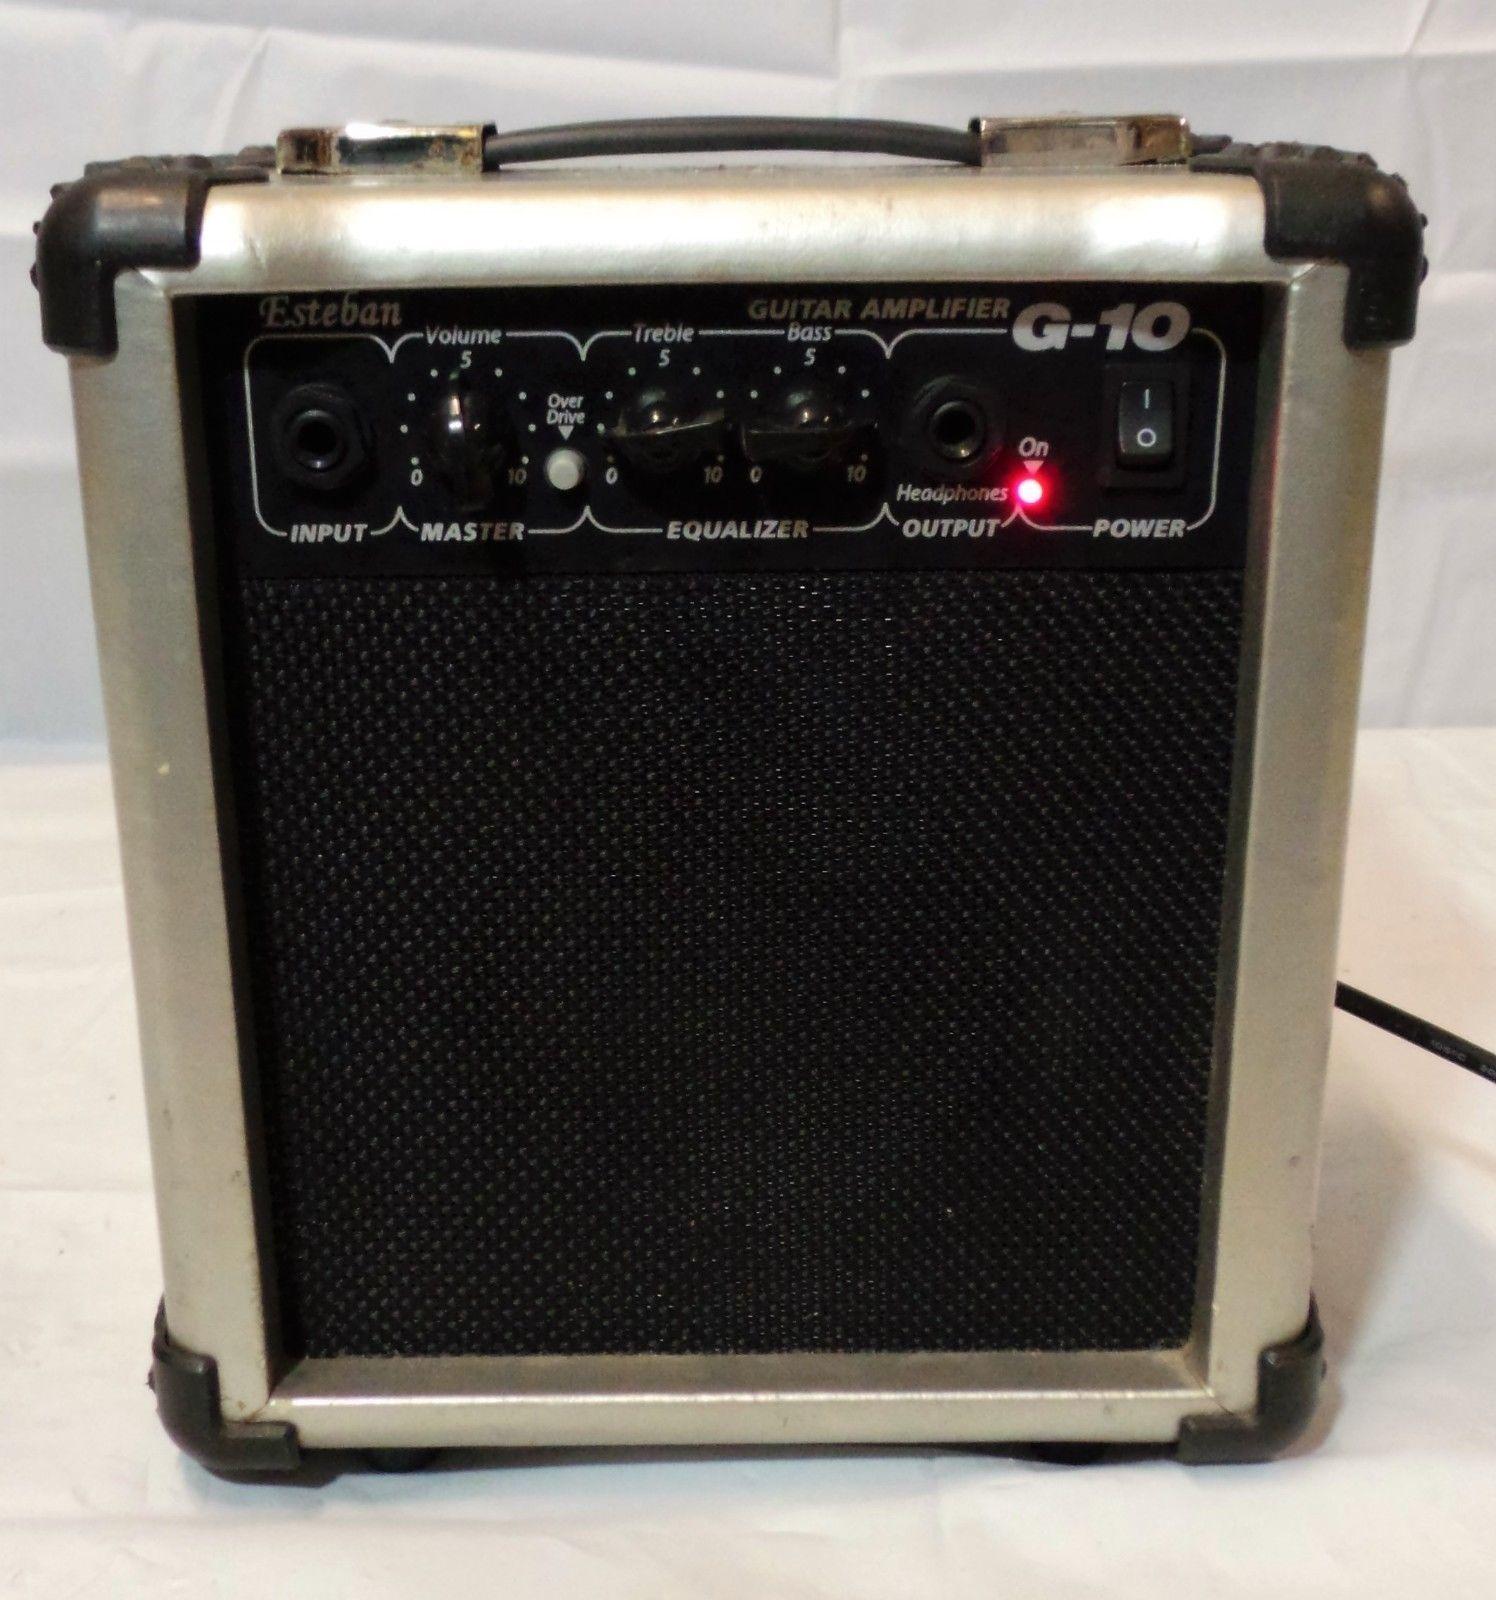 small resolution of esteban g10 12 watt guitar amp amplifier electric acoustic music portable mobile please retweet